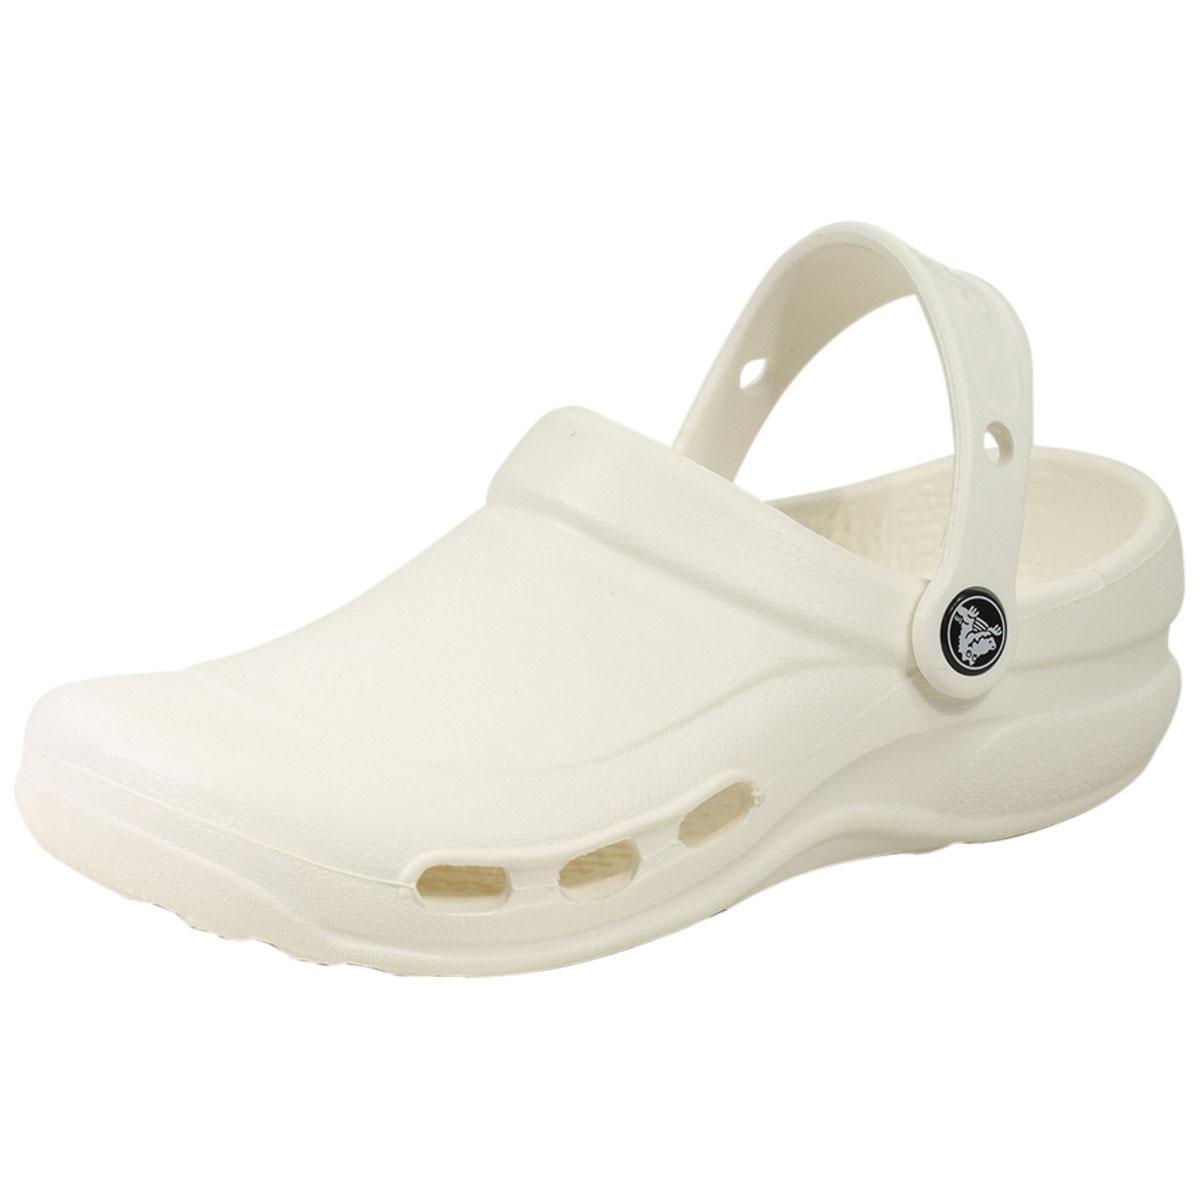 Image of Crocs At Work Specialist Vent Clogs Sandals Shoes - White - 9 D(M) US/11 B(M) US